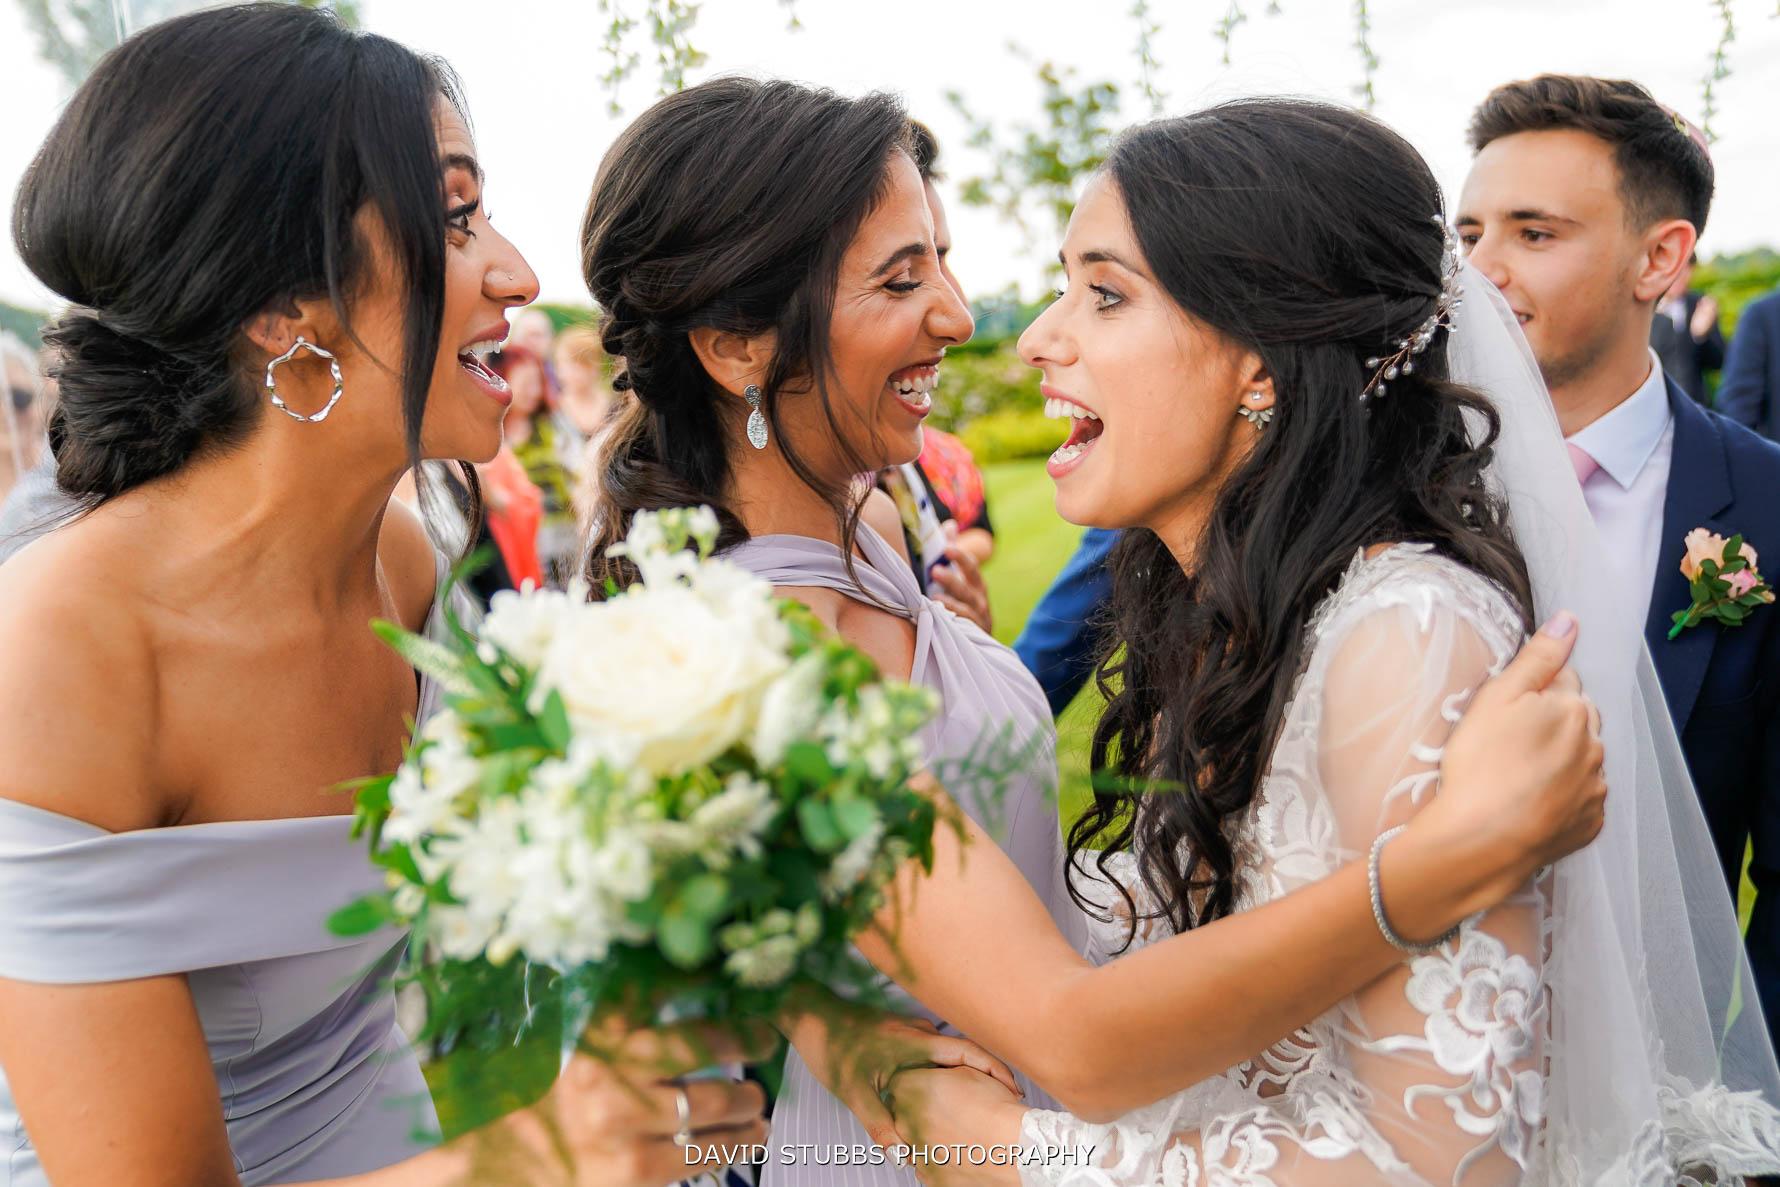 congratulating the newlyweds